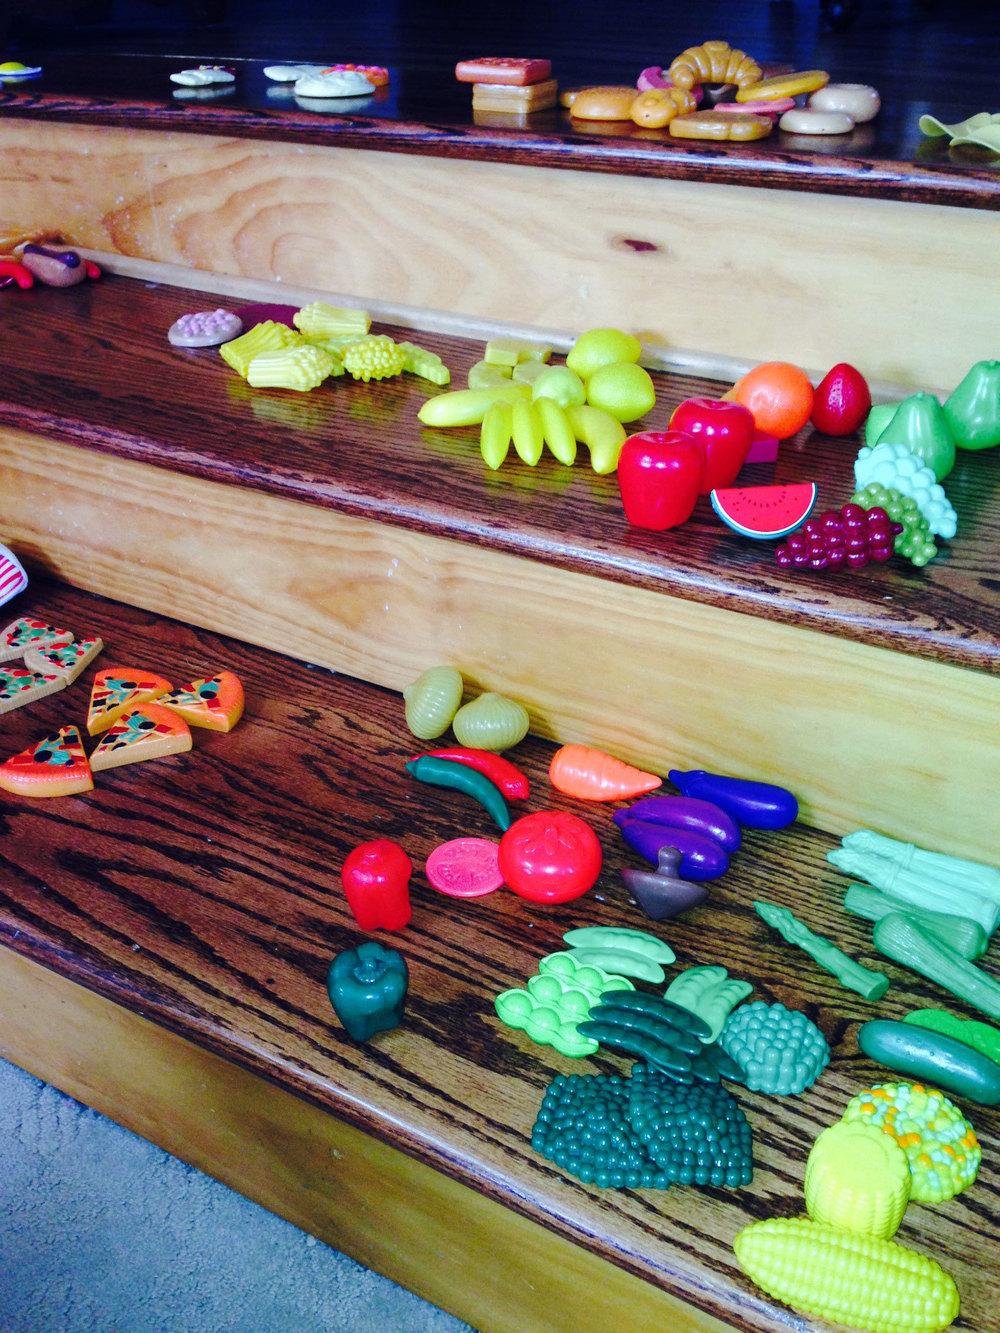 b-food-photo.jpg